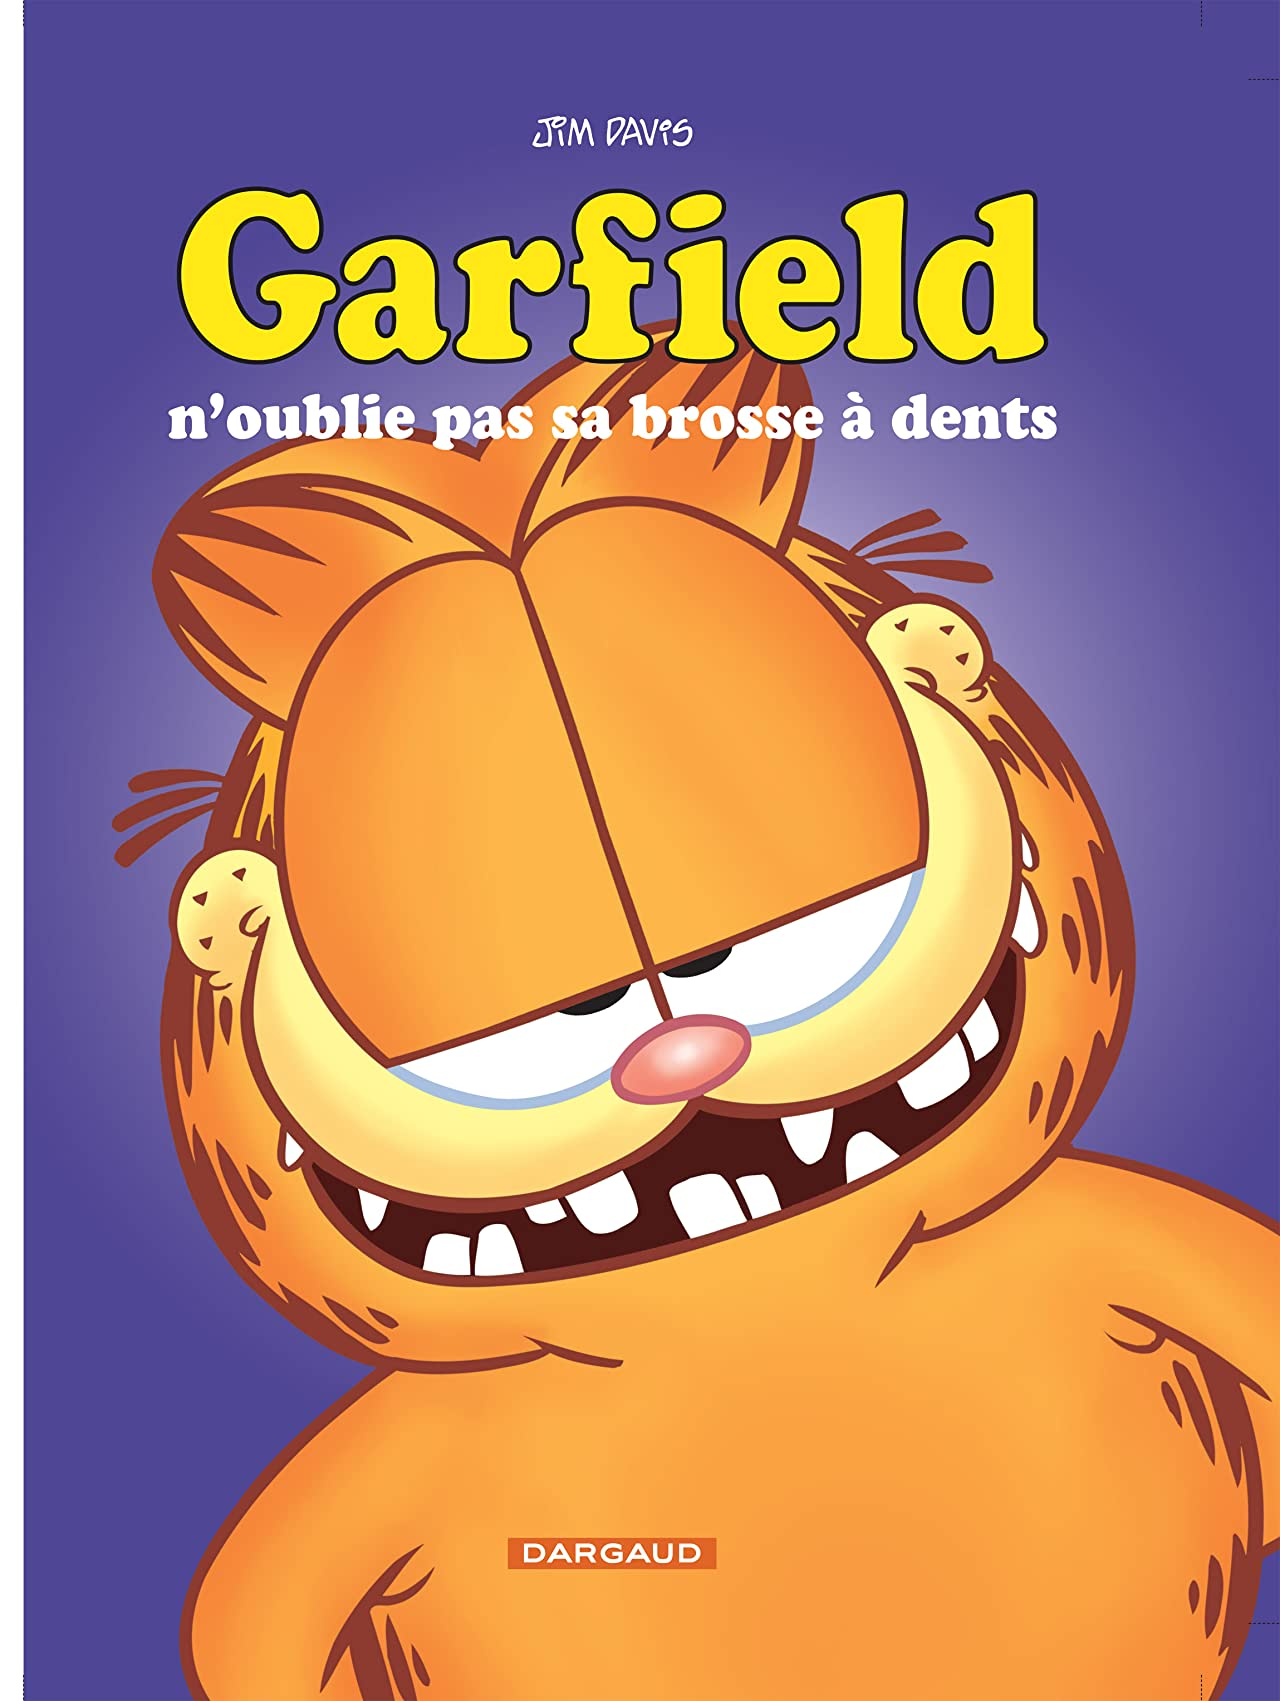 Garfield Vol. 22: Garfield n'oublie pas sa brosse à dent